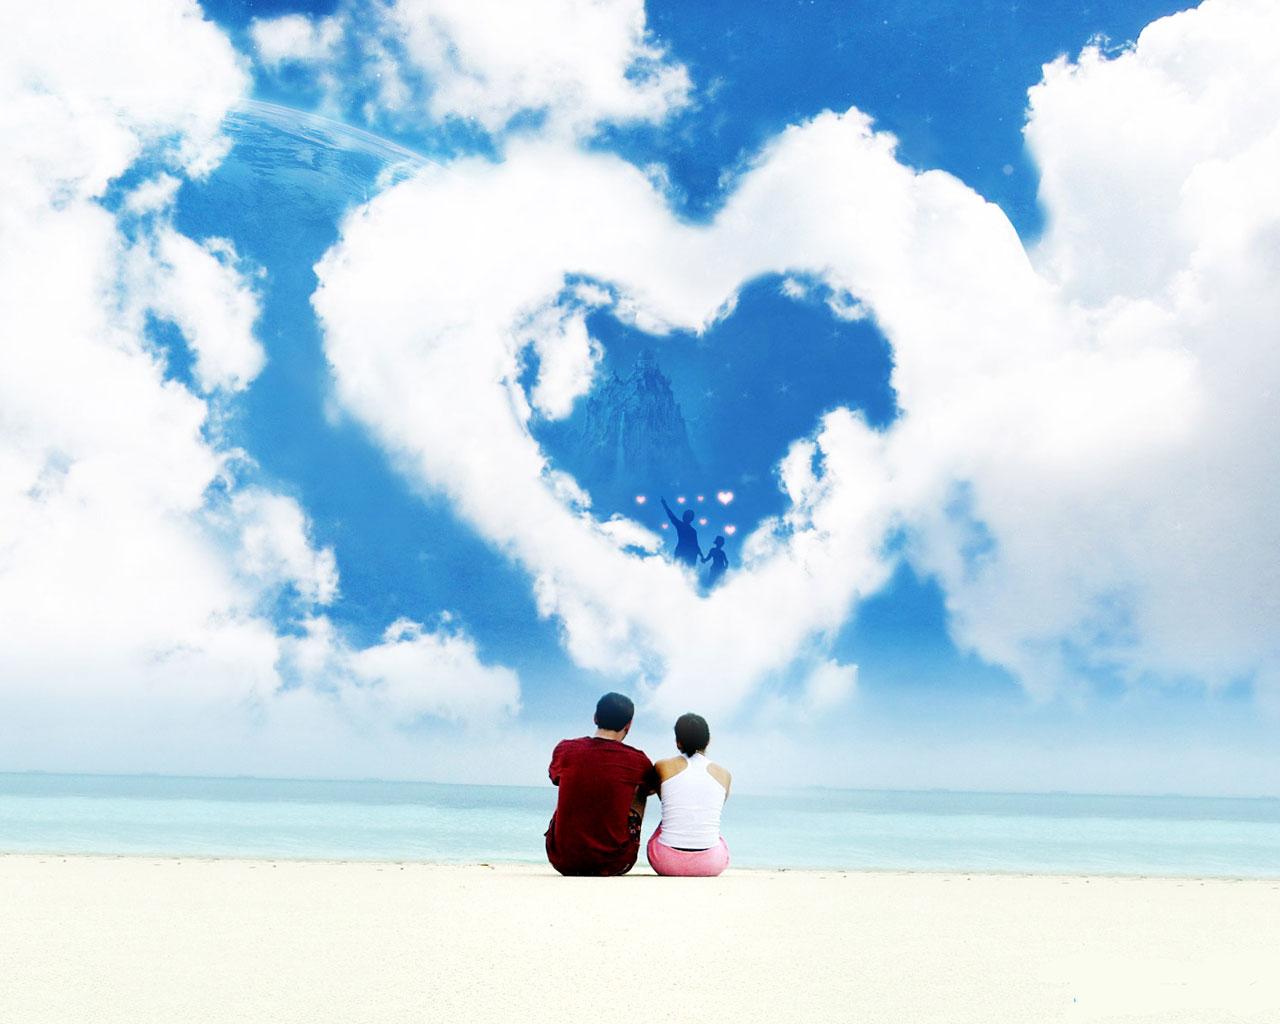 http://4.bp.blogspot.com/_V8Os1iEgKAc/TCu_w1eDI1I/AAAAAAAAAOM/W2VBt1xTmtw/s1600/valentine-wallpapers5.jpg